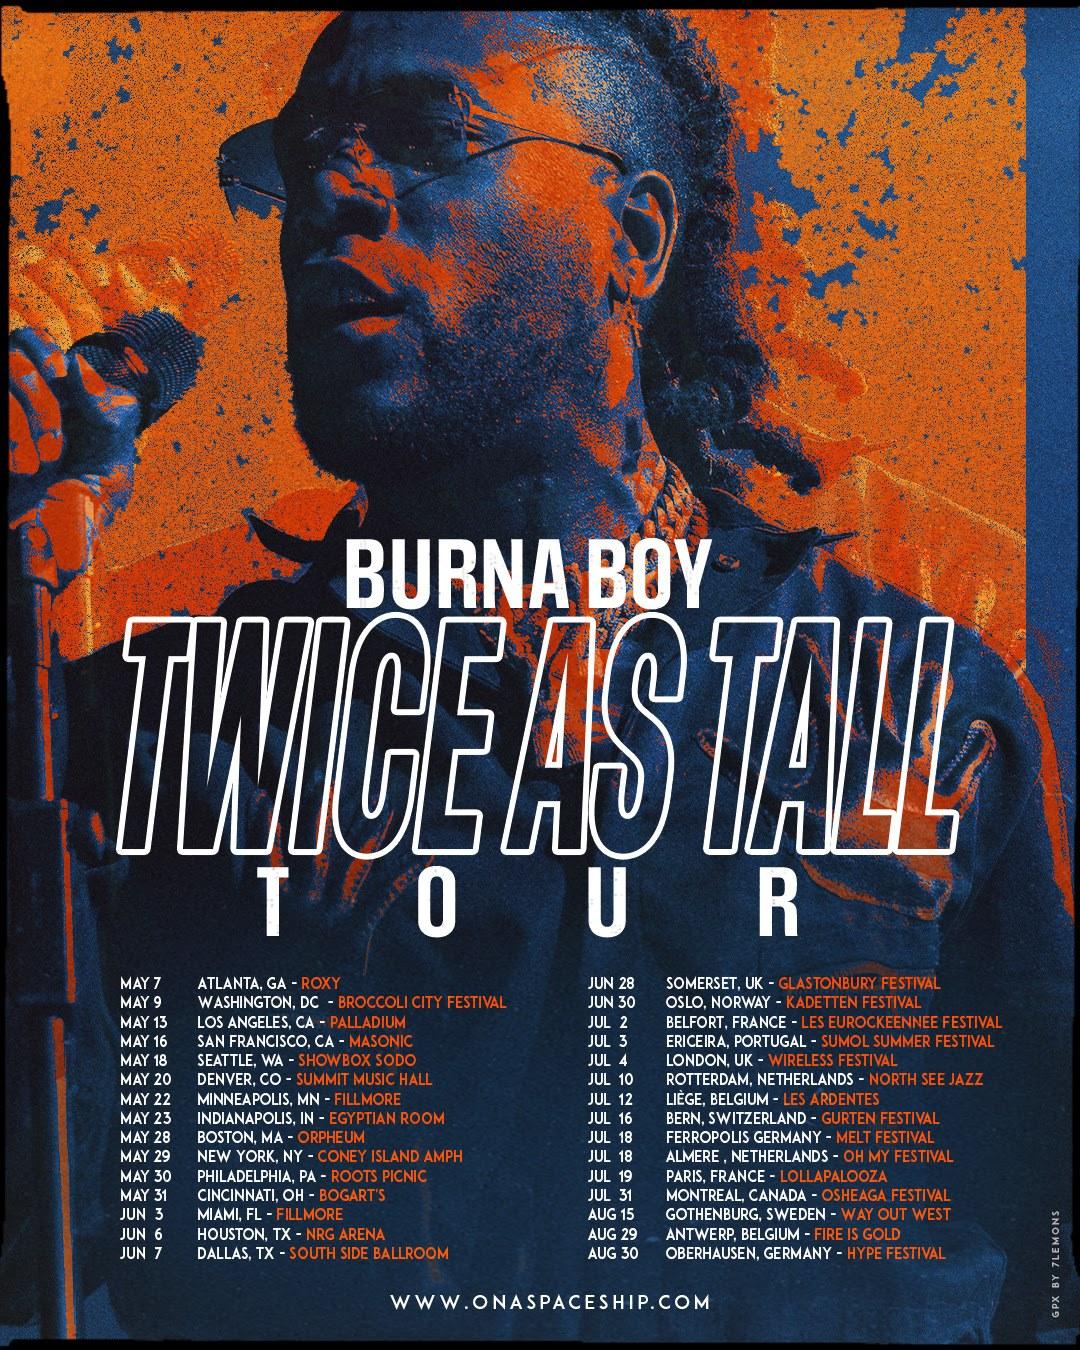 Burna Boy Announces Twice As Tall Tour